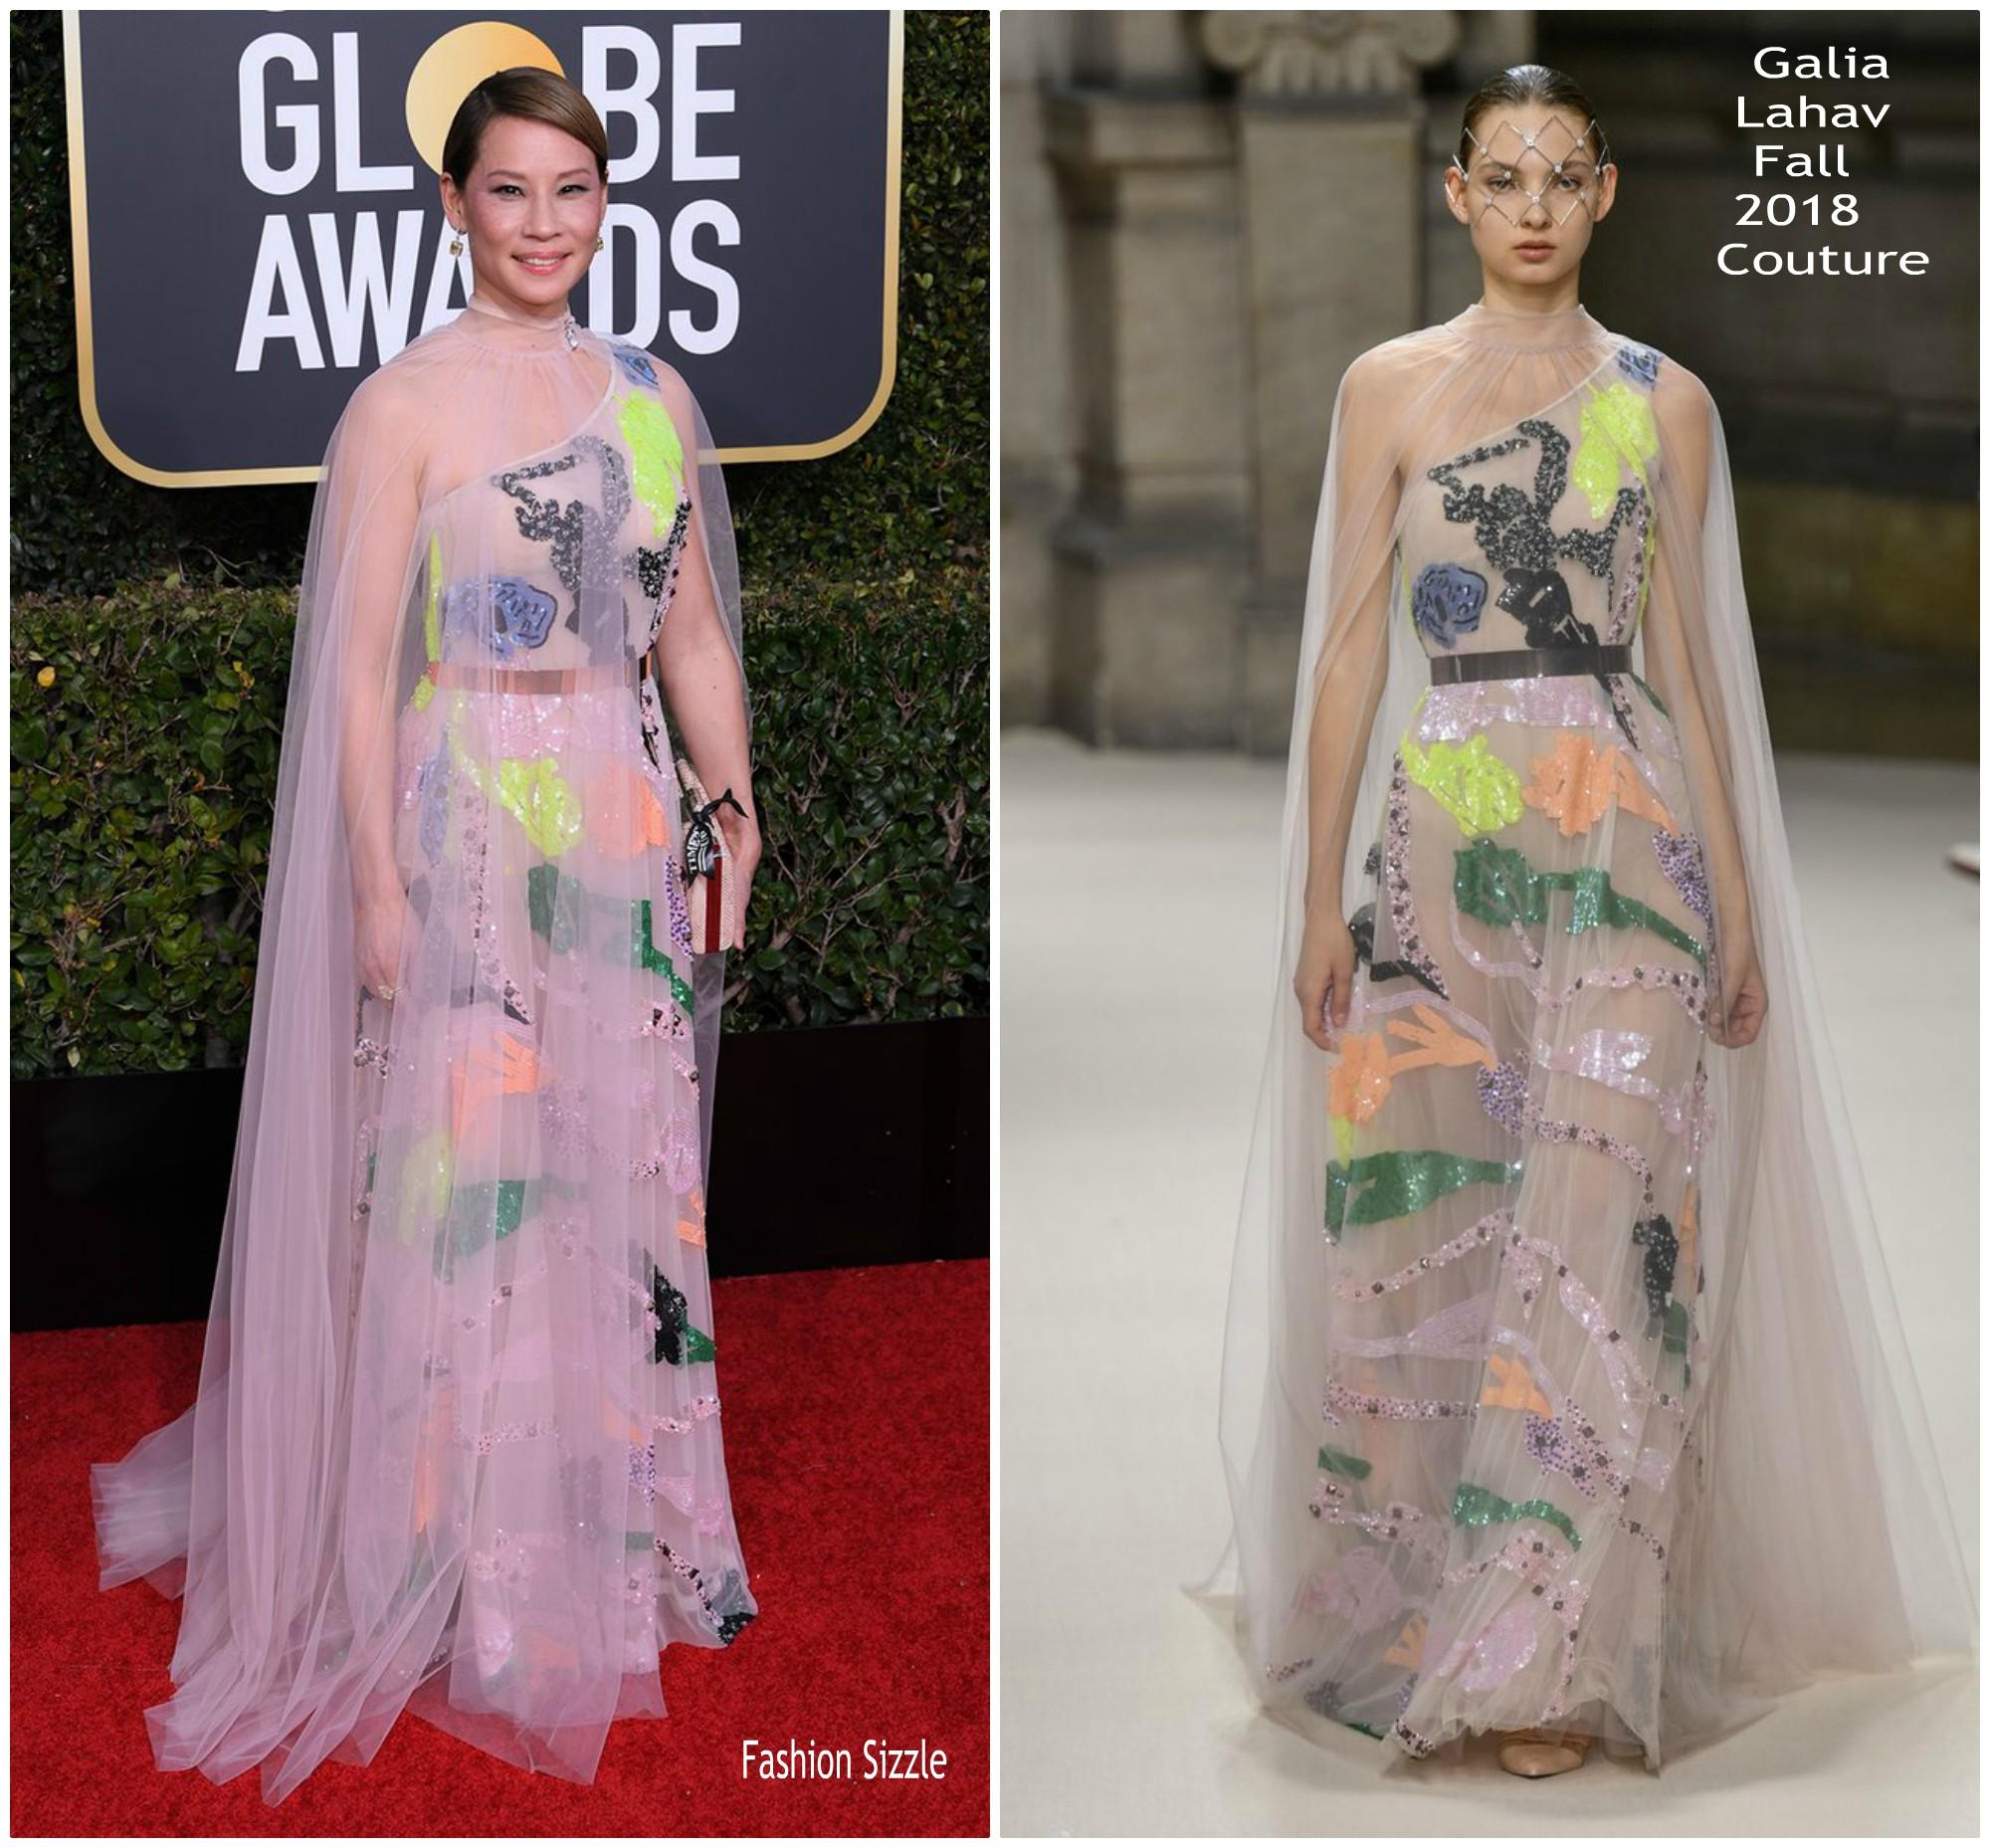 lucy-liu-in-galia-lahav-couture-2019-golden-globe-awards